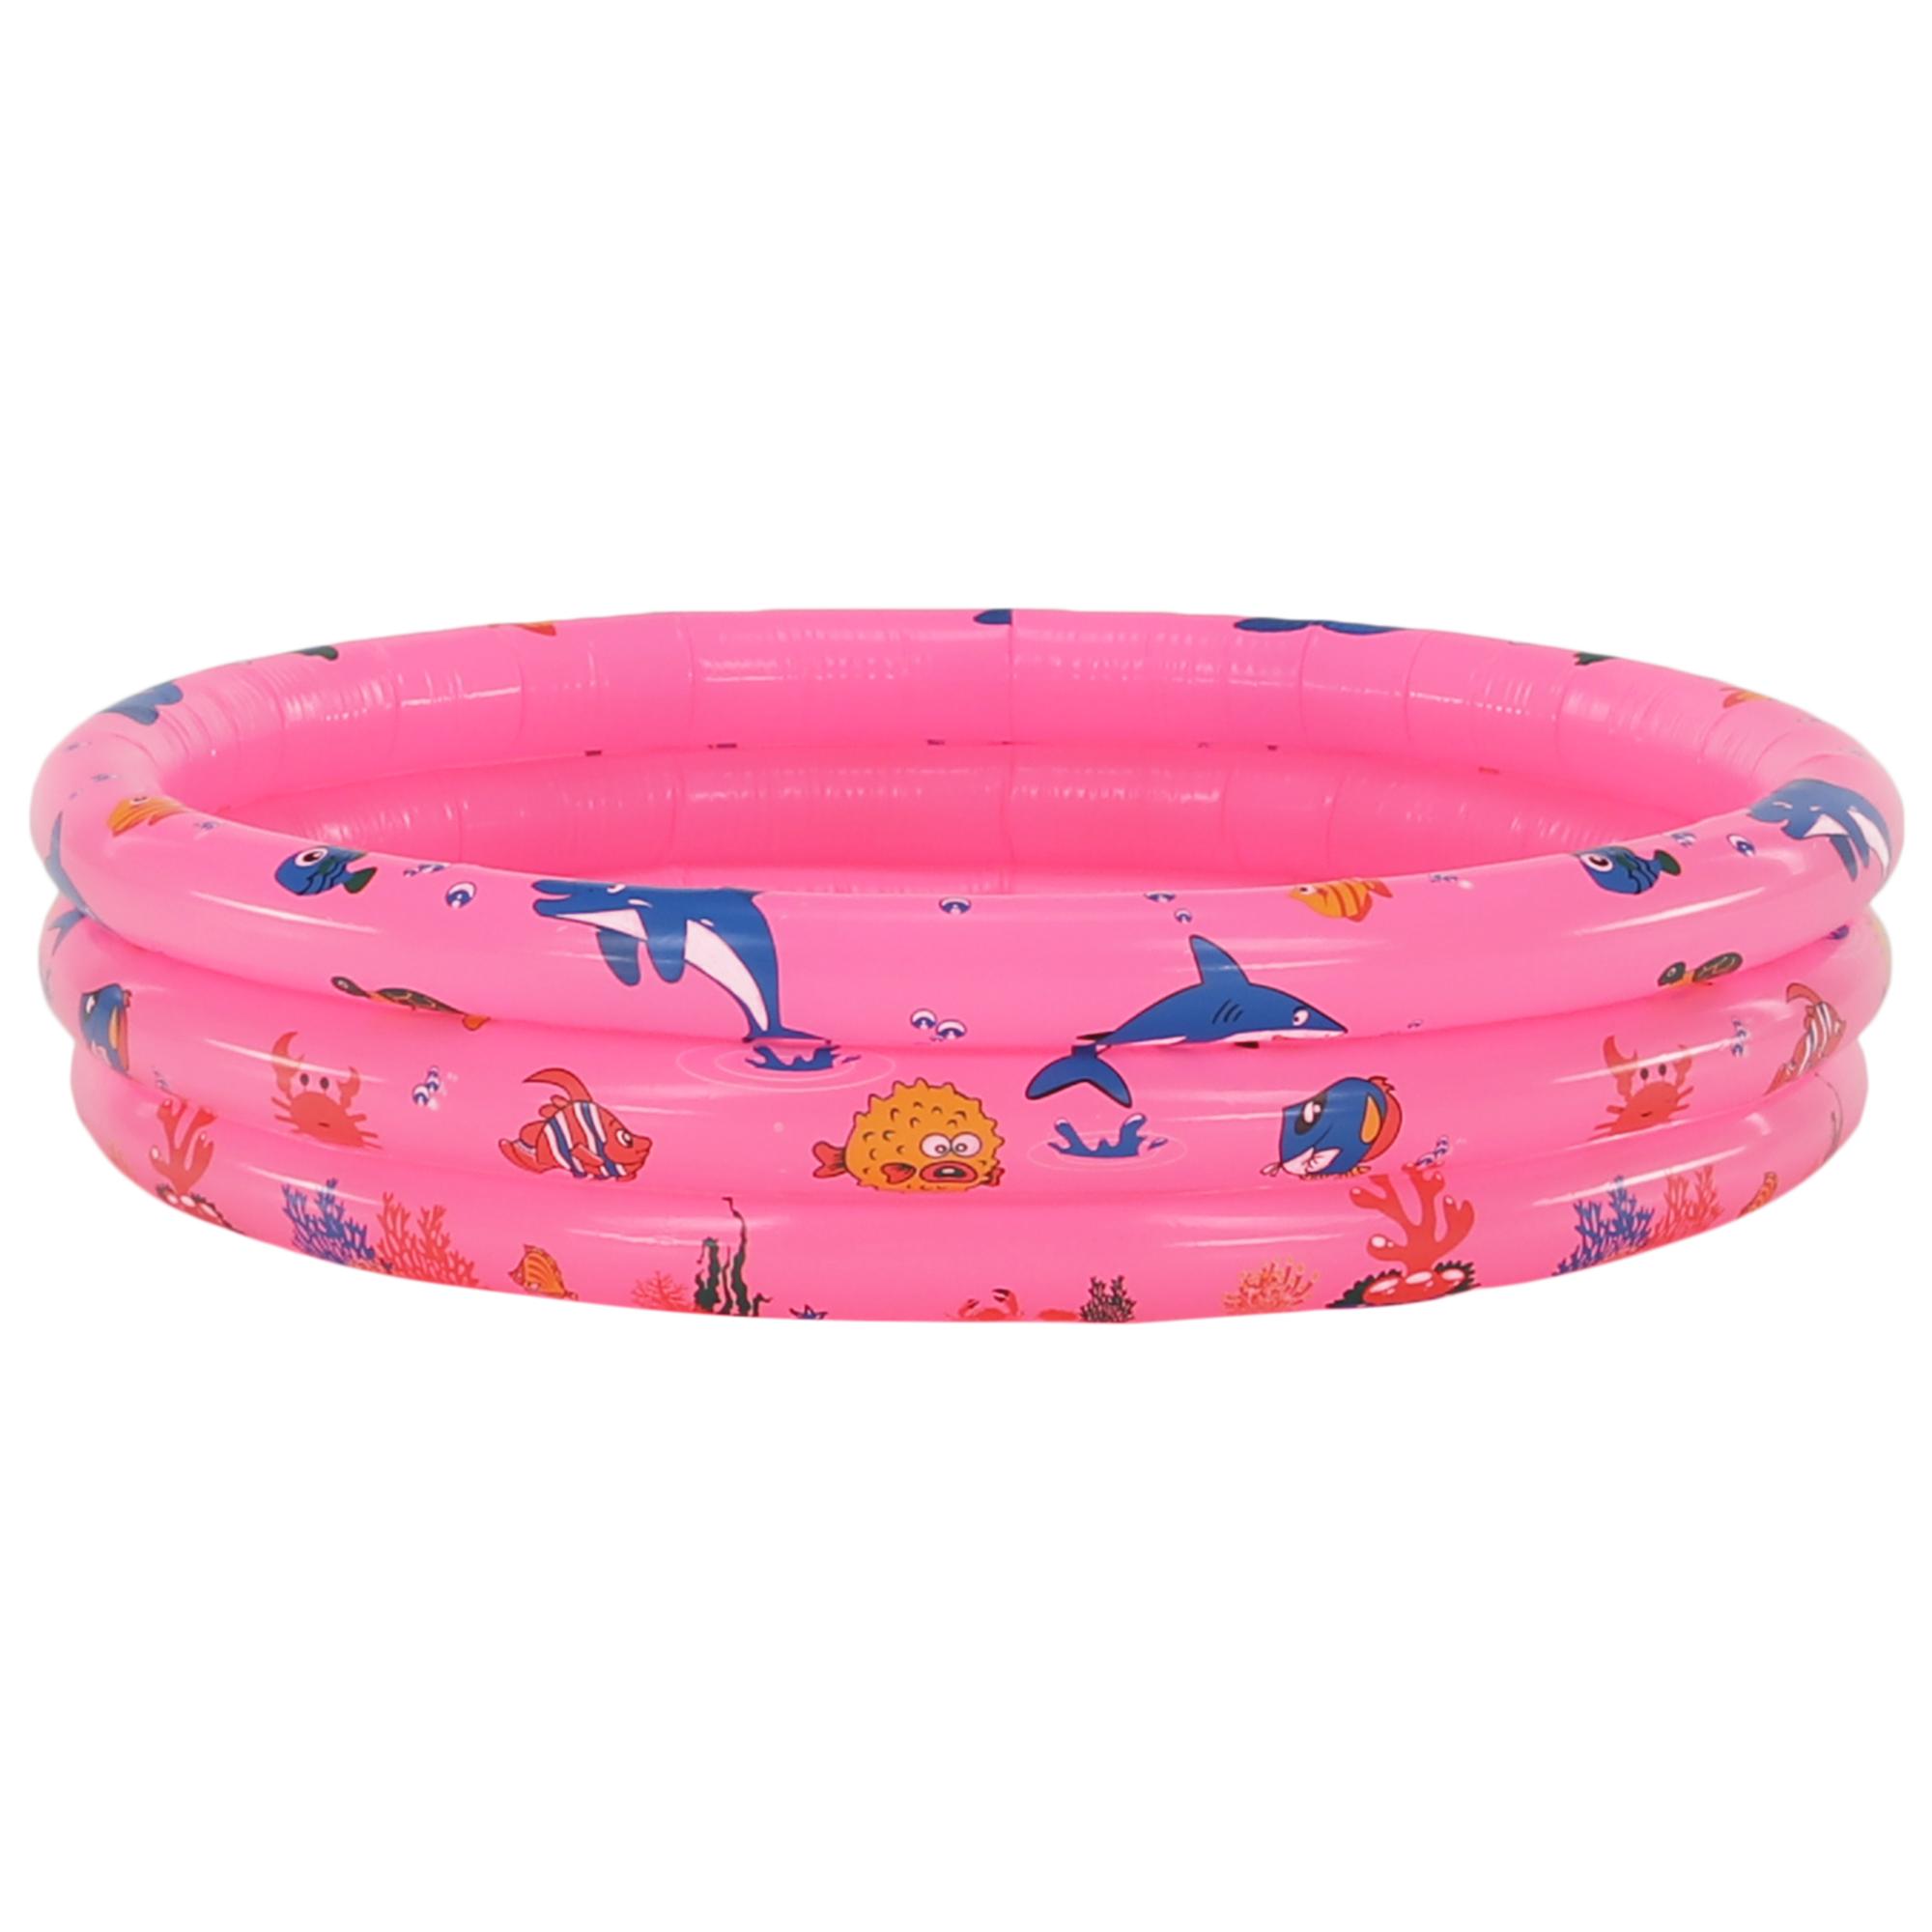 Bazin gonflabil pentru copii, roz / model, LOME